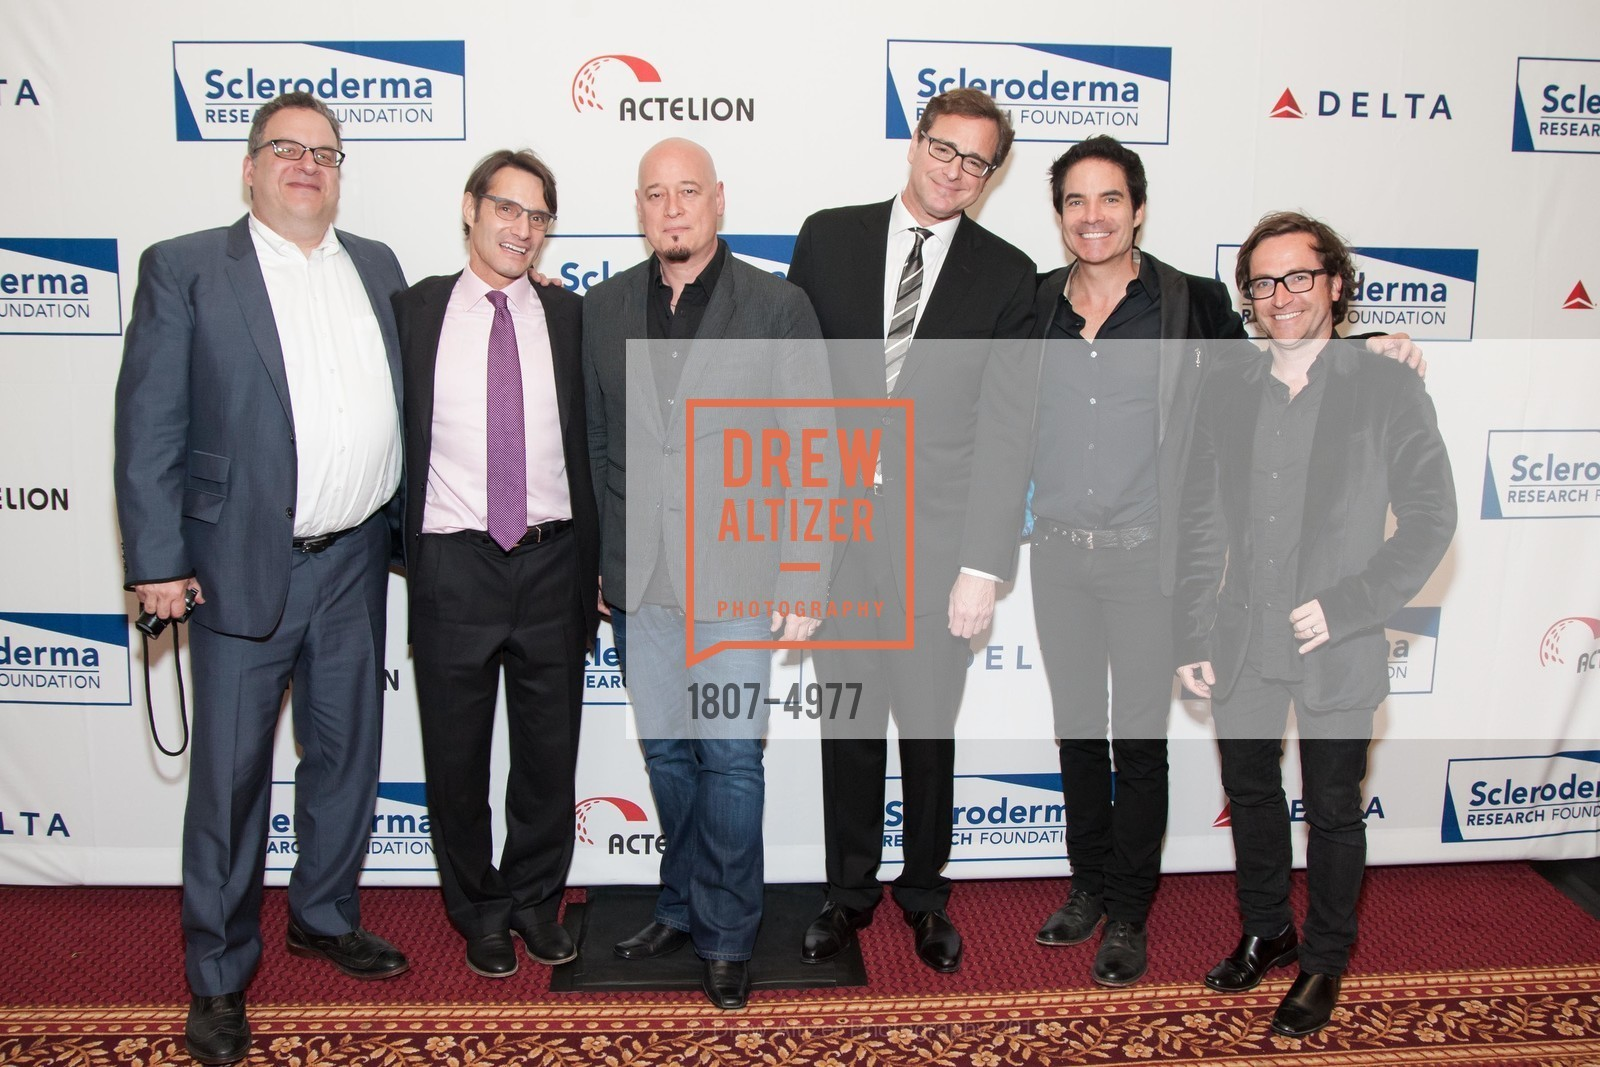 Jeff Garlin, Luke Evnin, Jimmy Stafford, Bob Saget, Pat Monahan, Jerry Becker, Photo #1807-4977